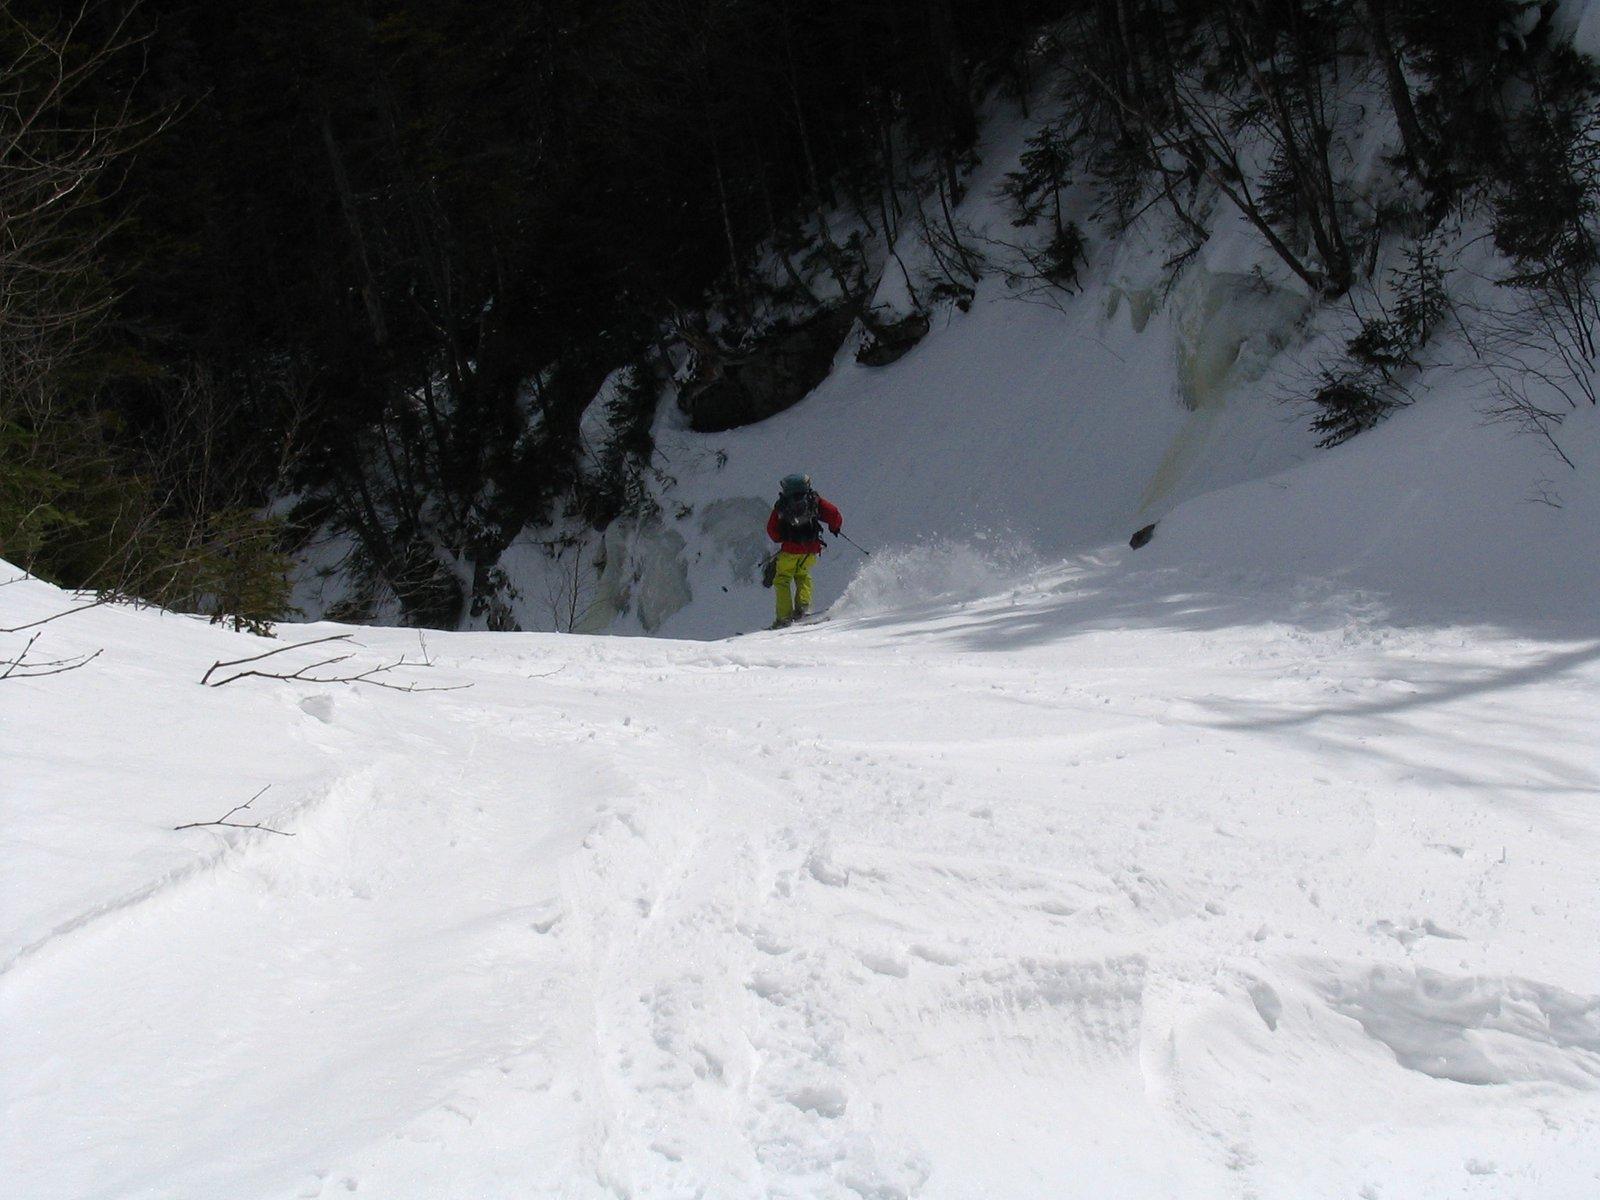 Droppin in a chute